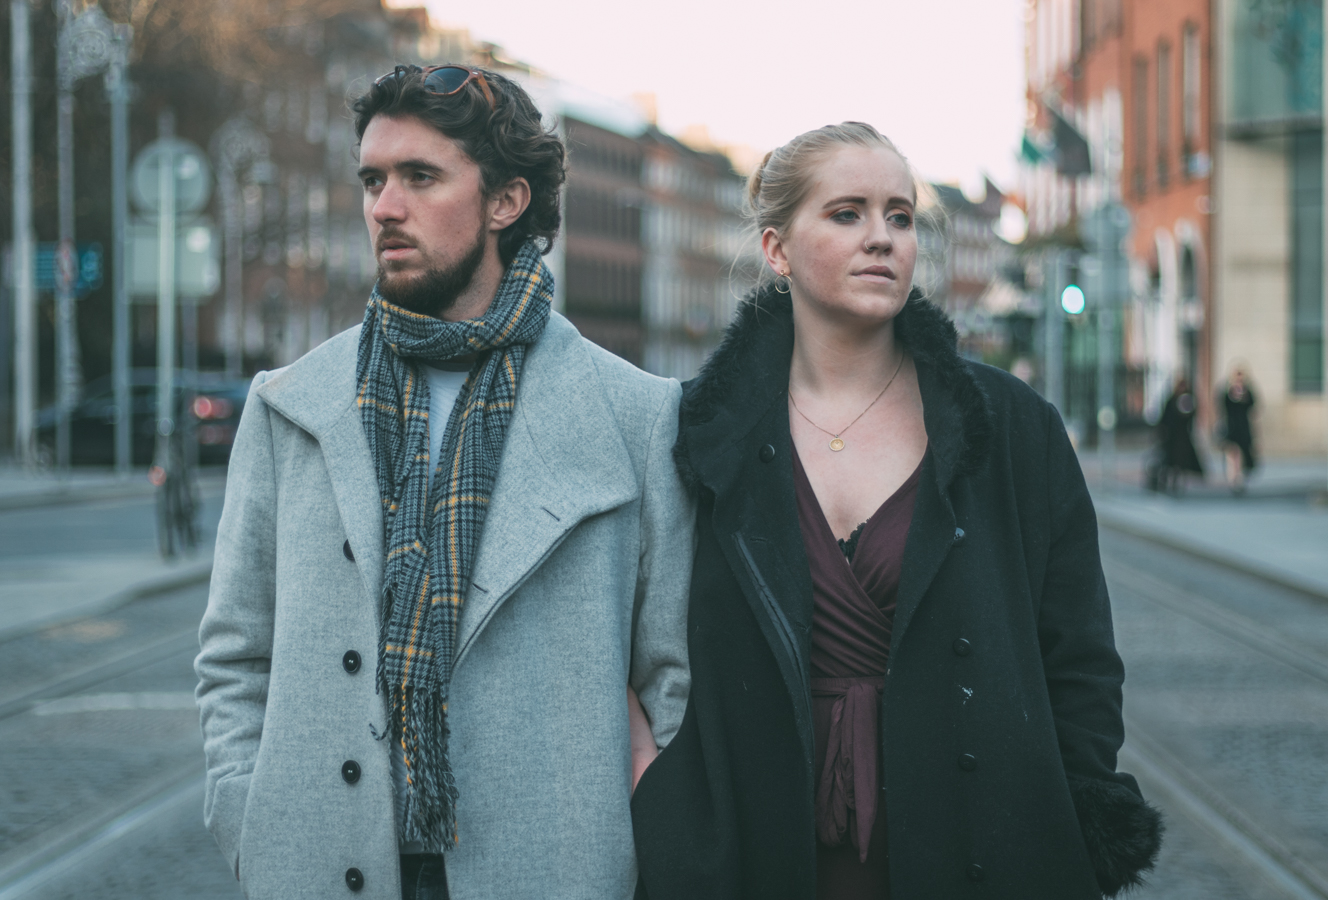 Ryan O'Shaughnessy & Zapho release new '100 Ways' single